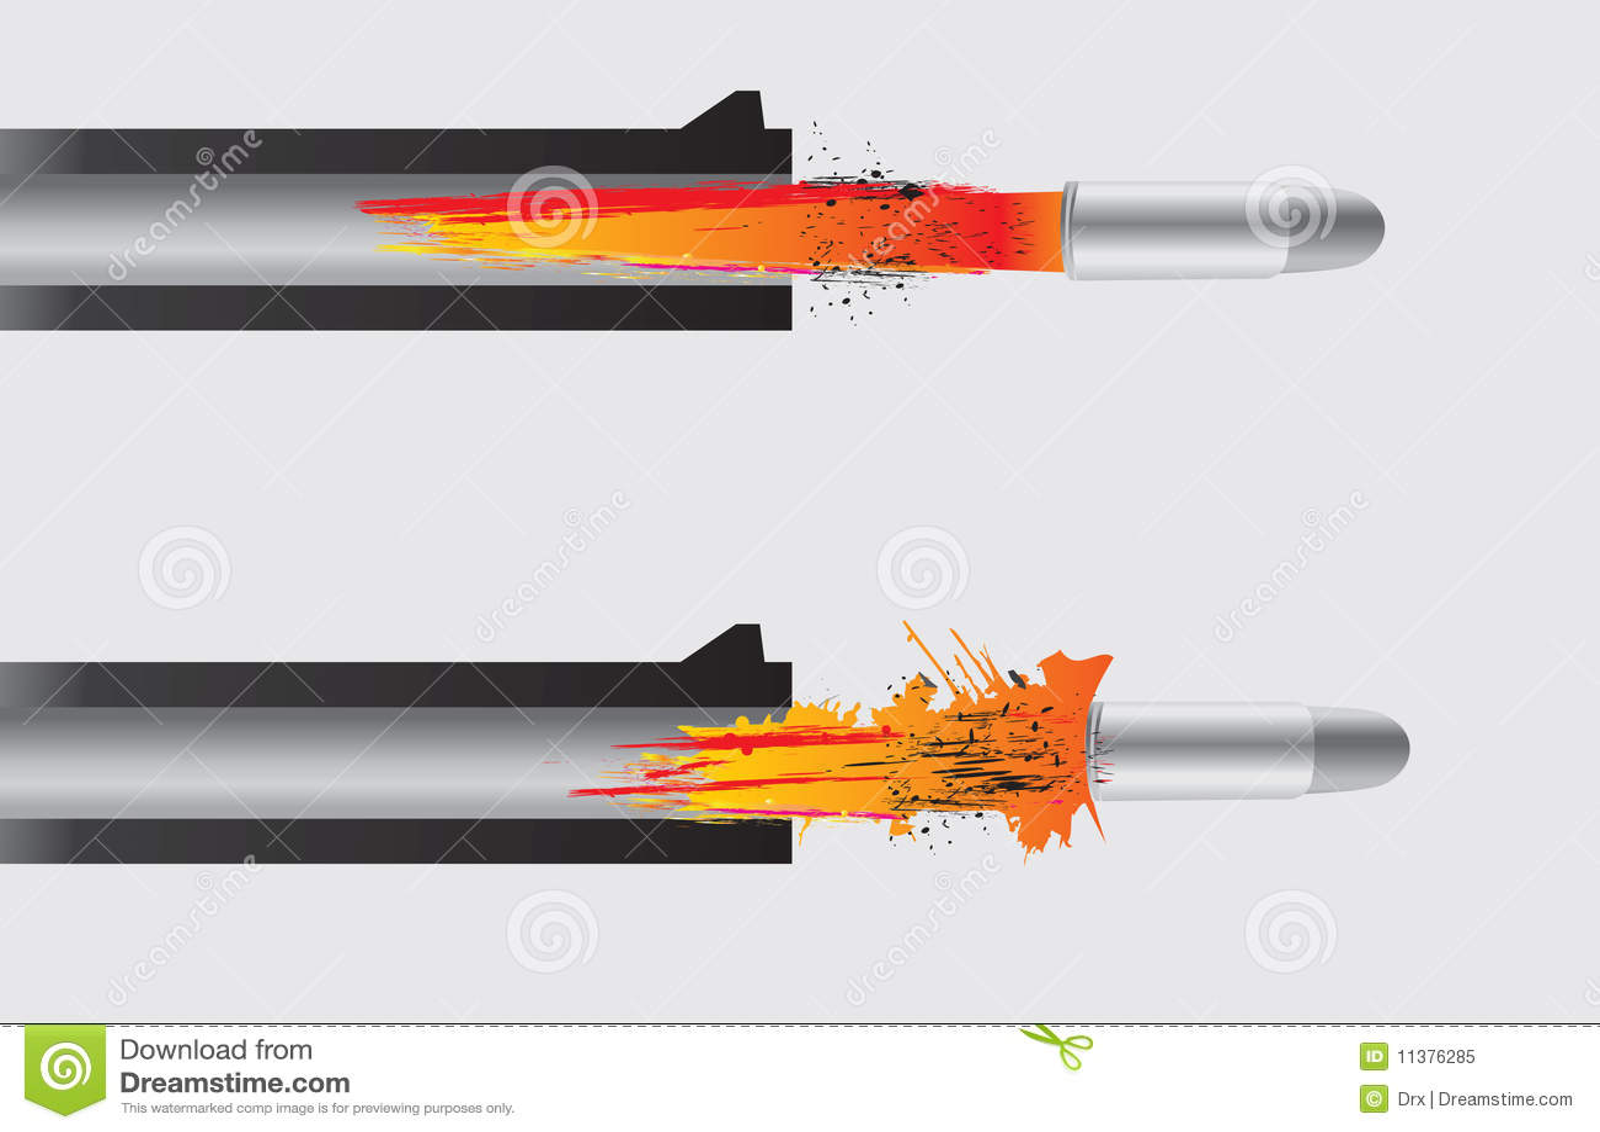 Gun firing the bullet stock vector. Image of detail, army ...